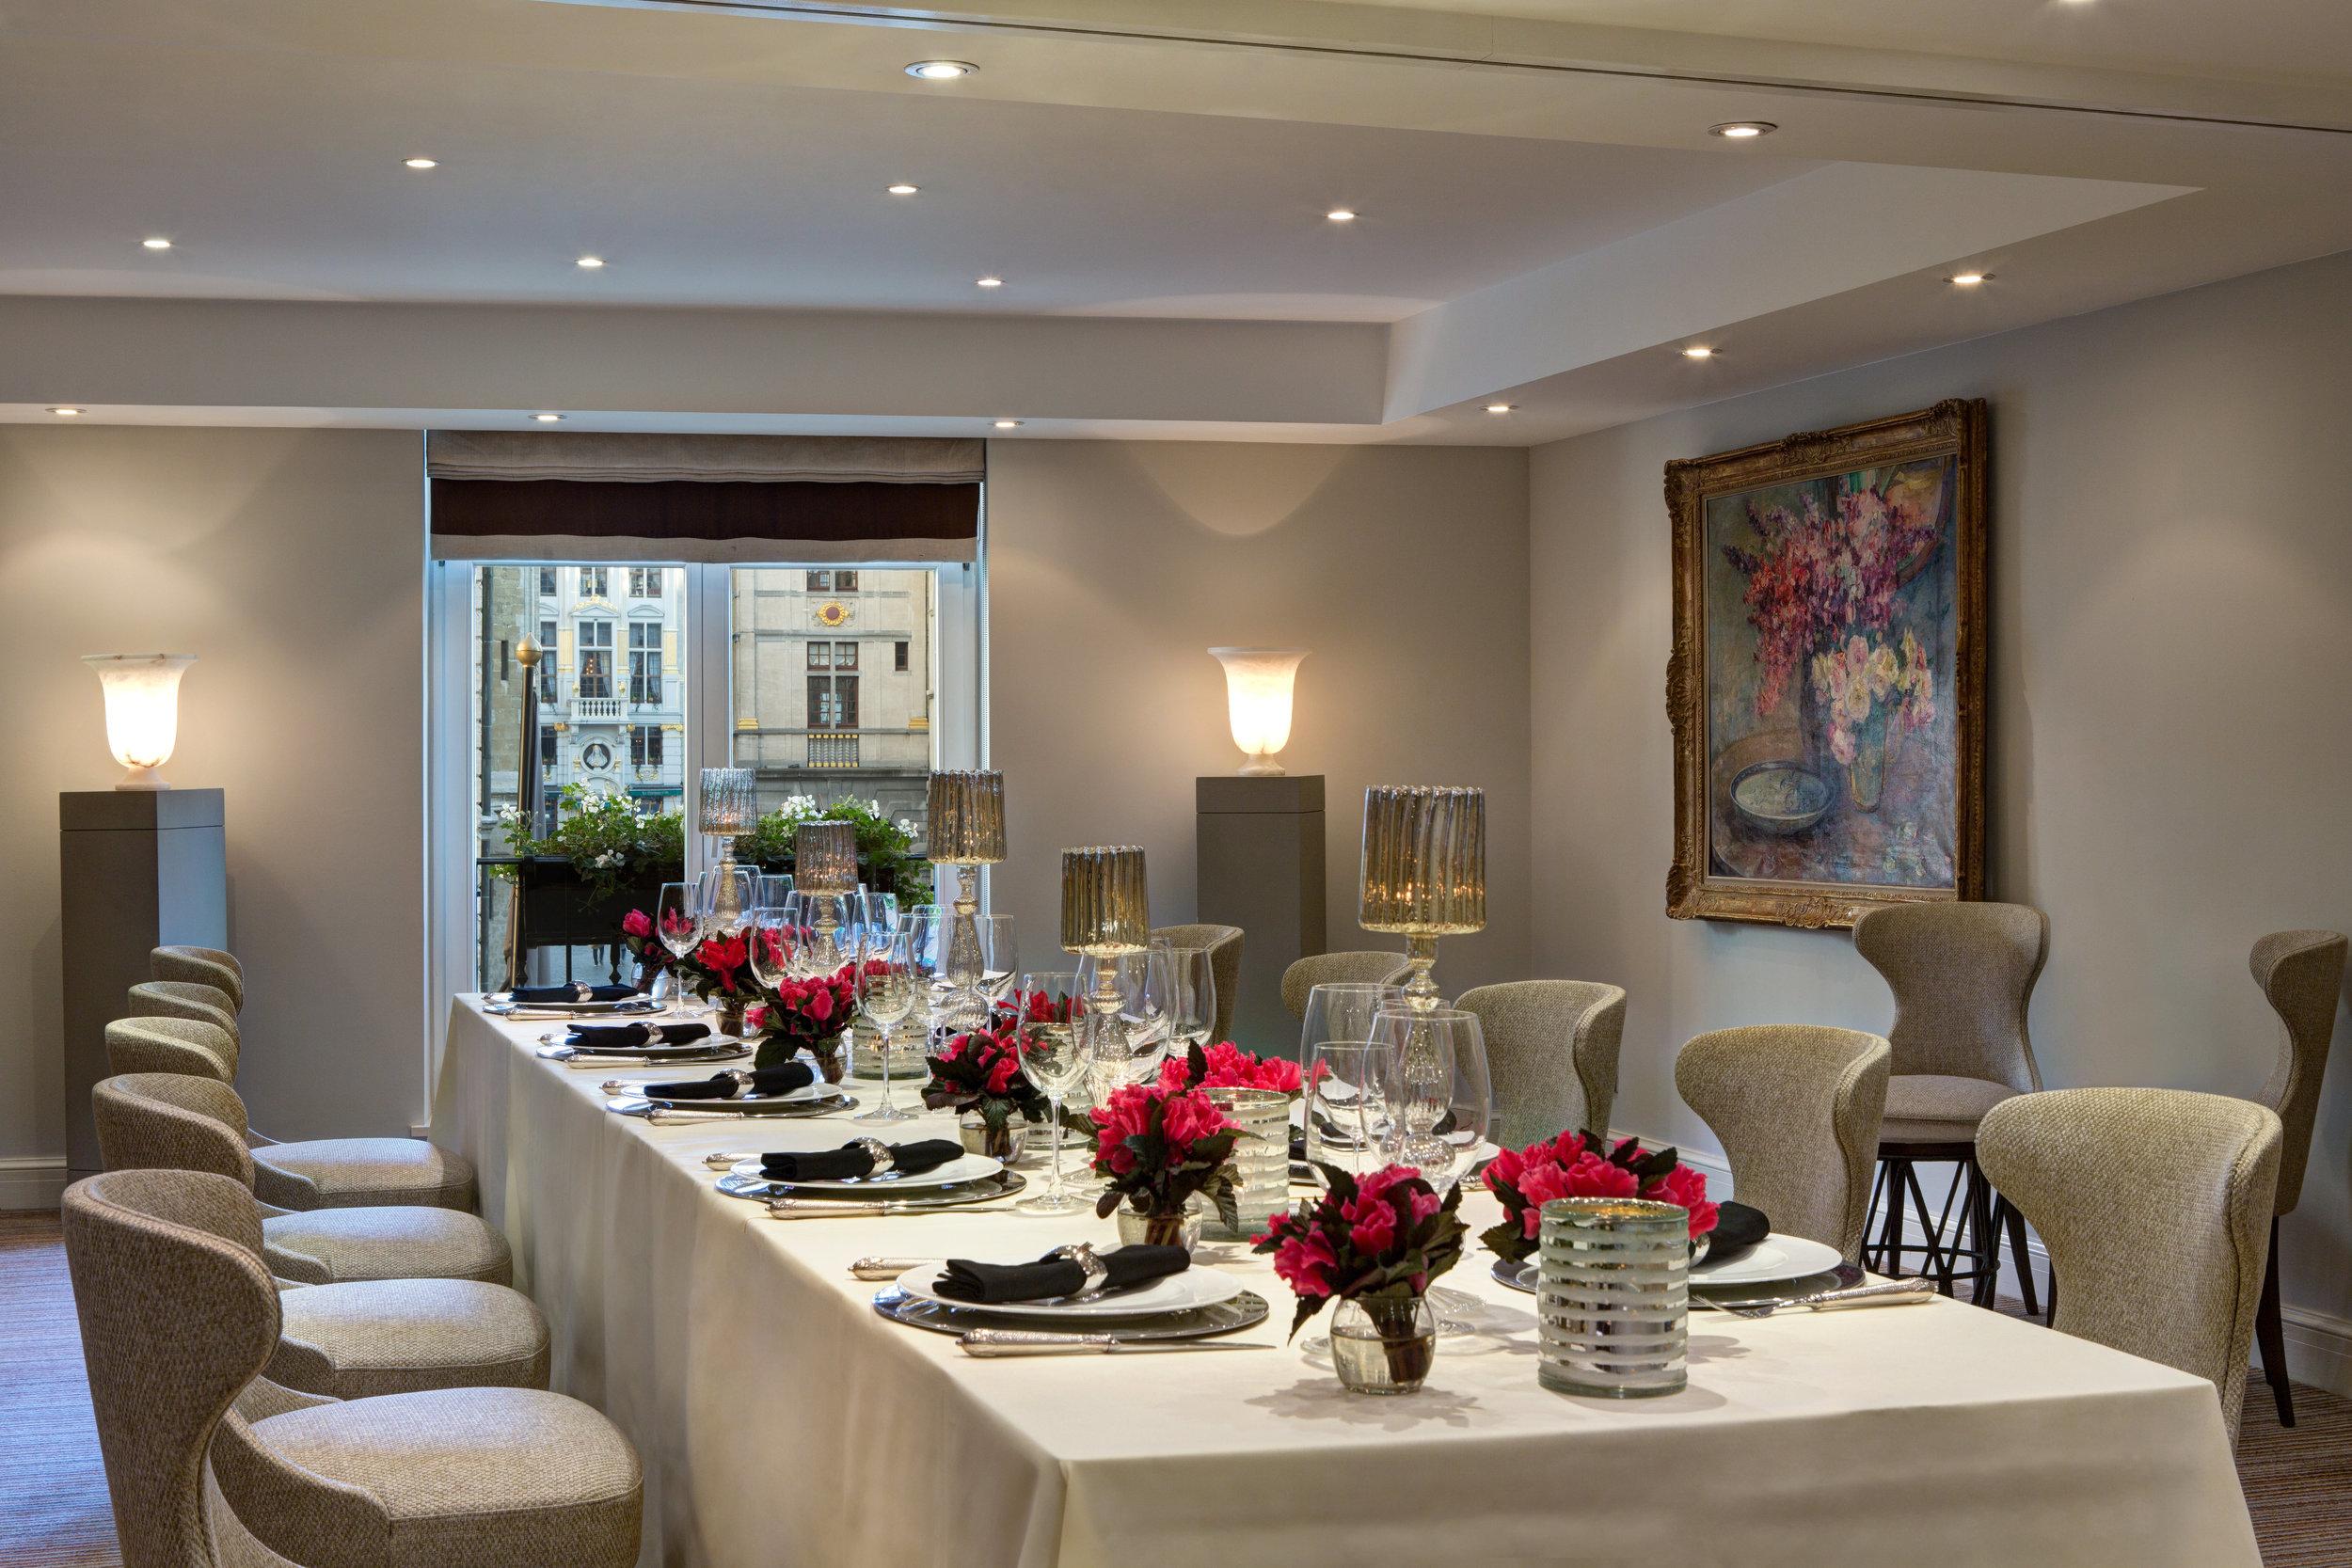 14 RFH Hotel Amigo - Herge Meeting Room 6824 JG Nov 16.jpg